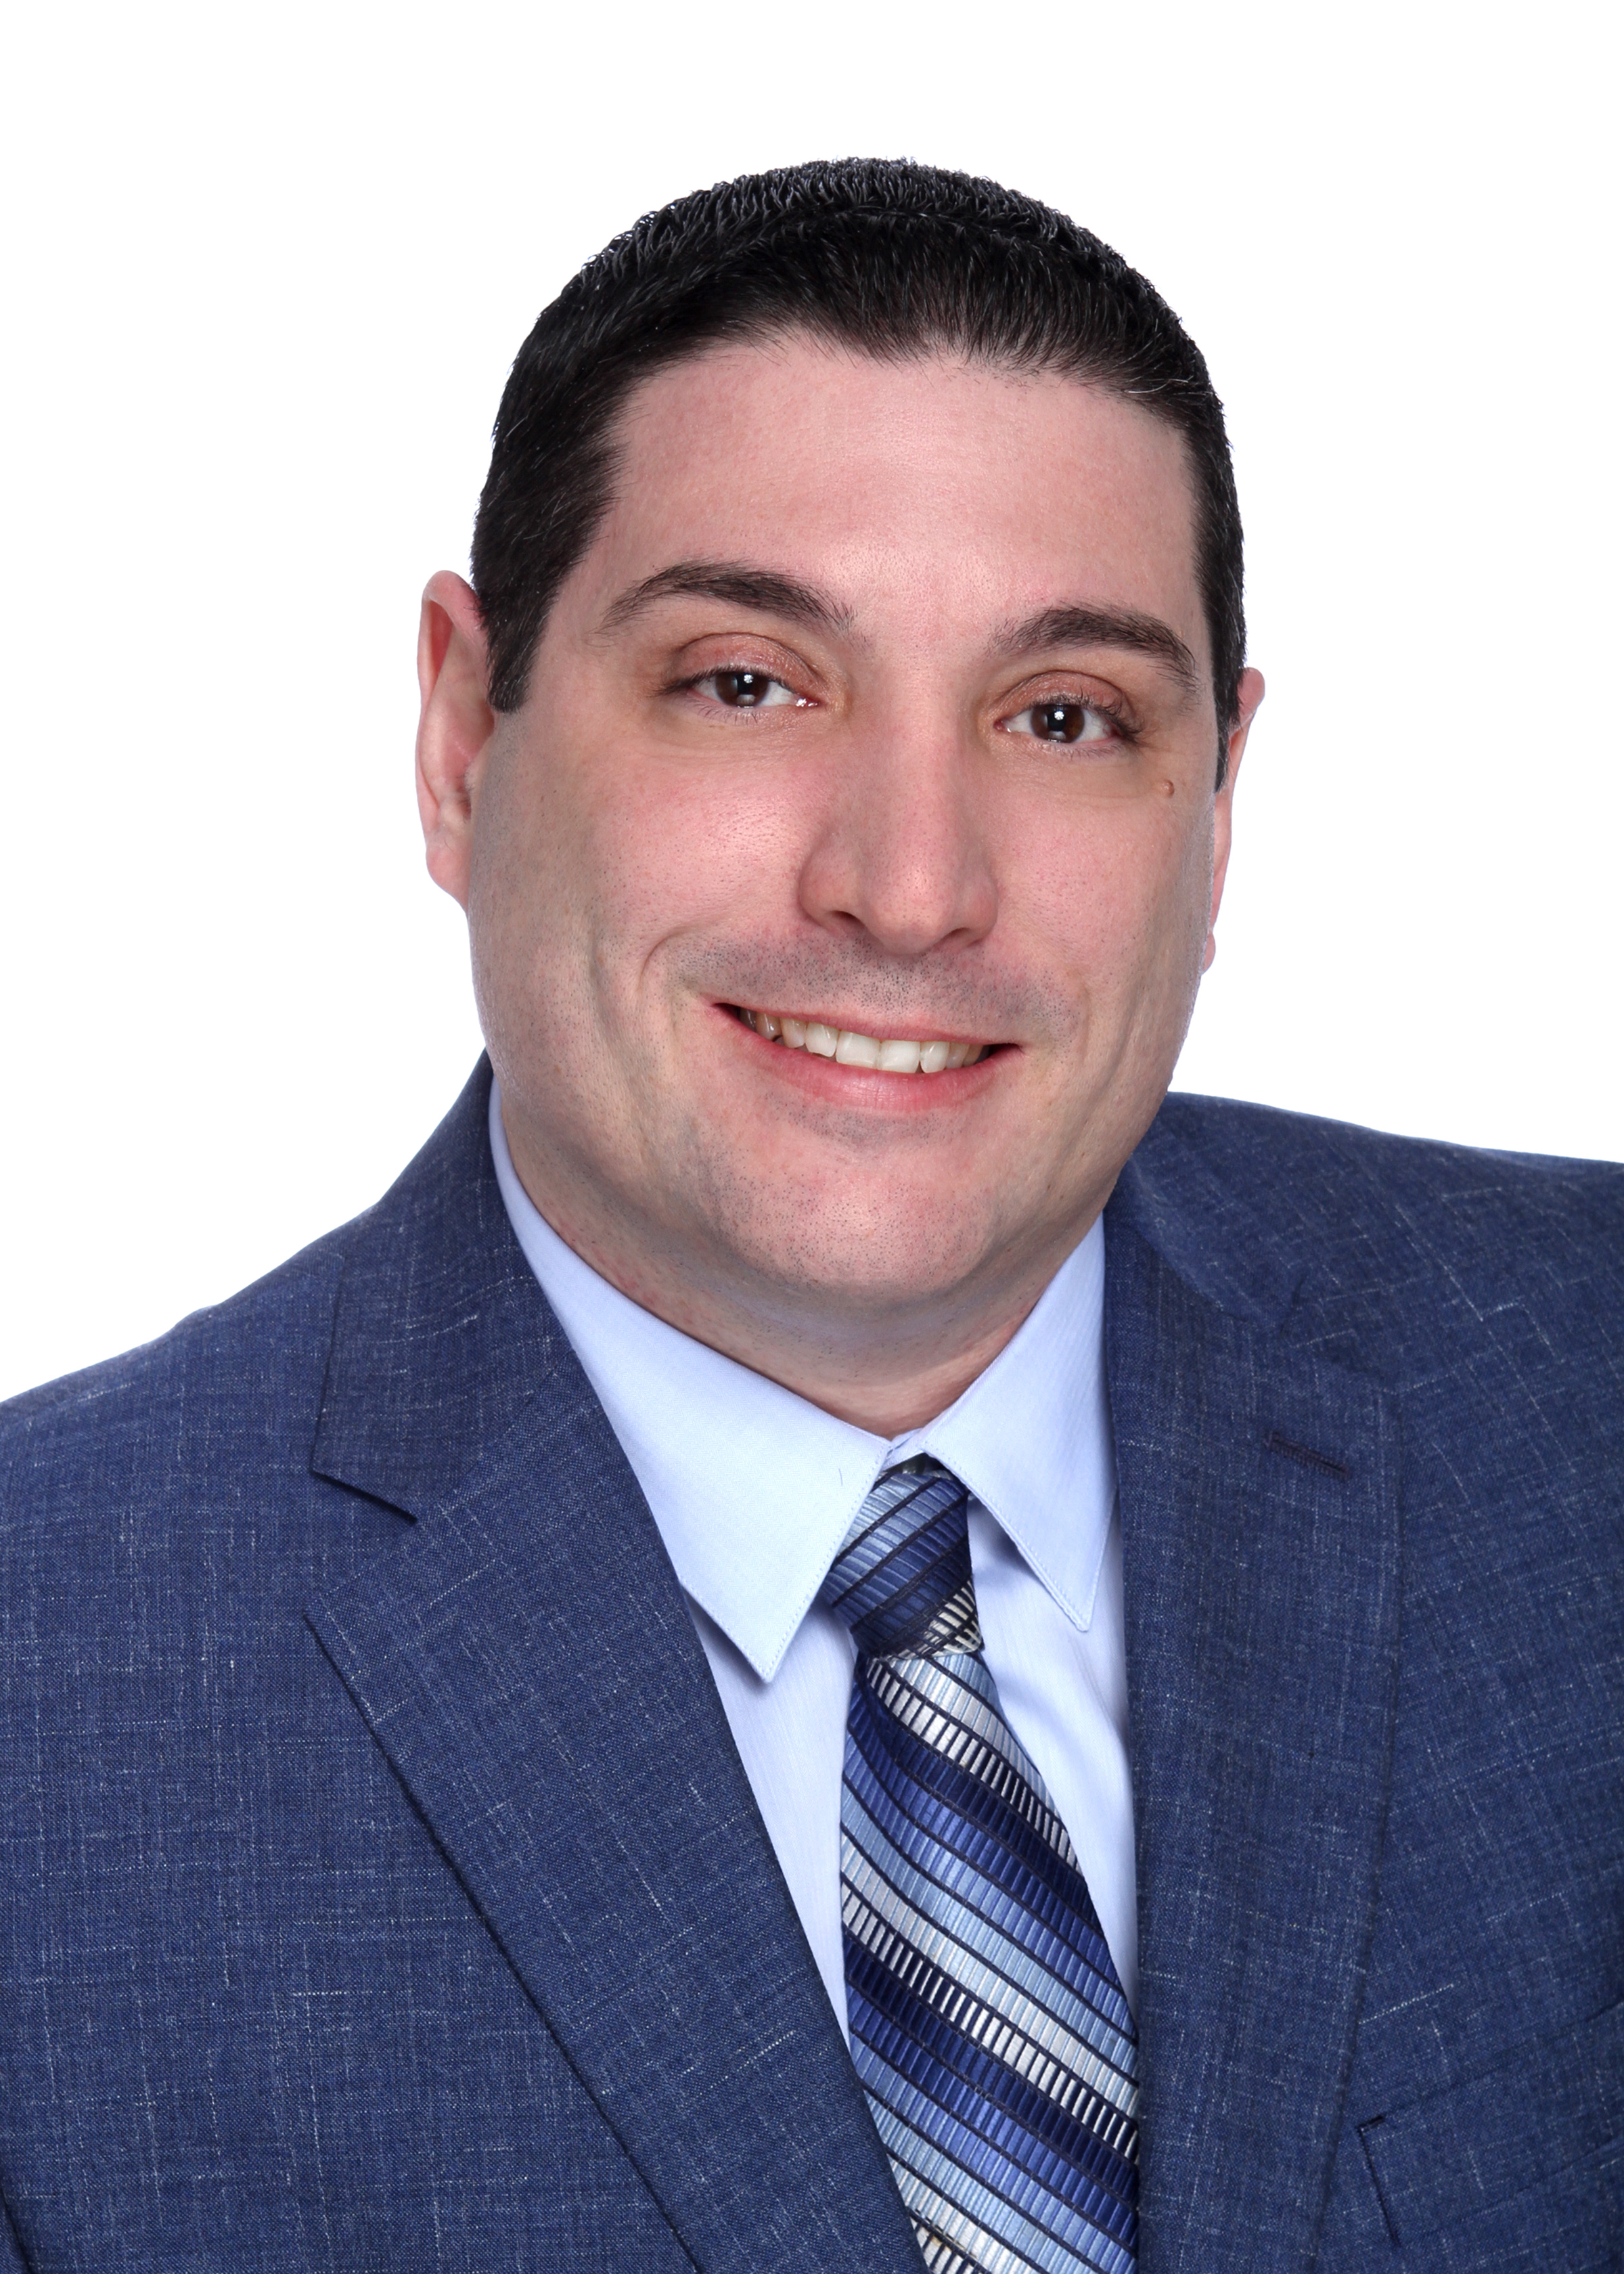 Jerry Ruocco